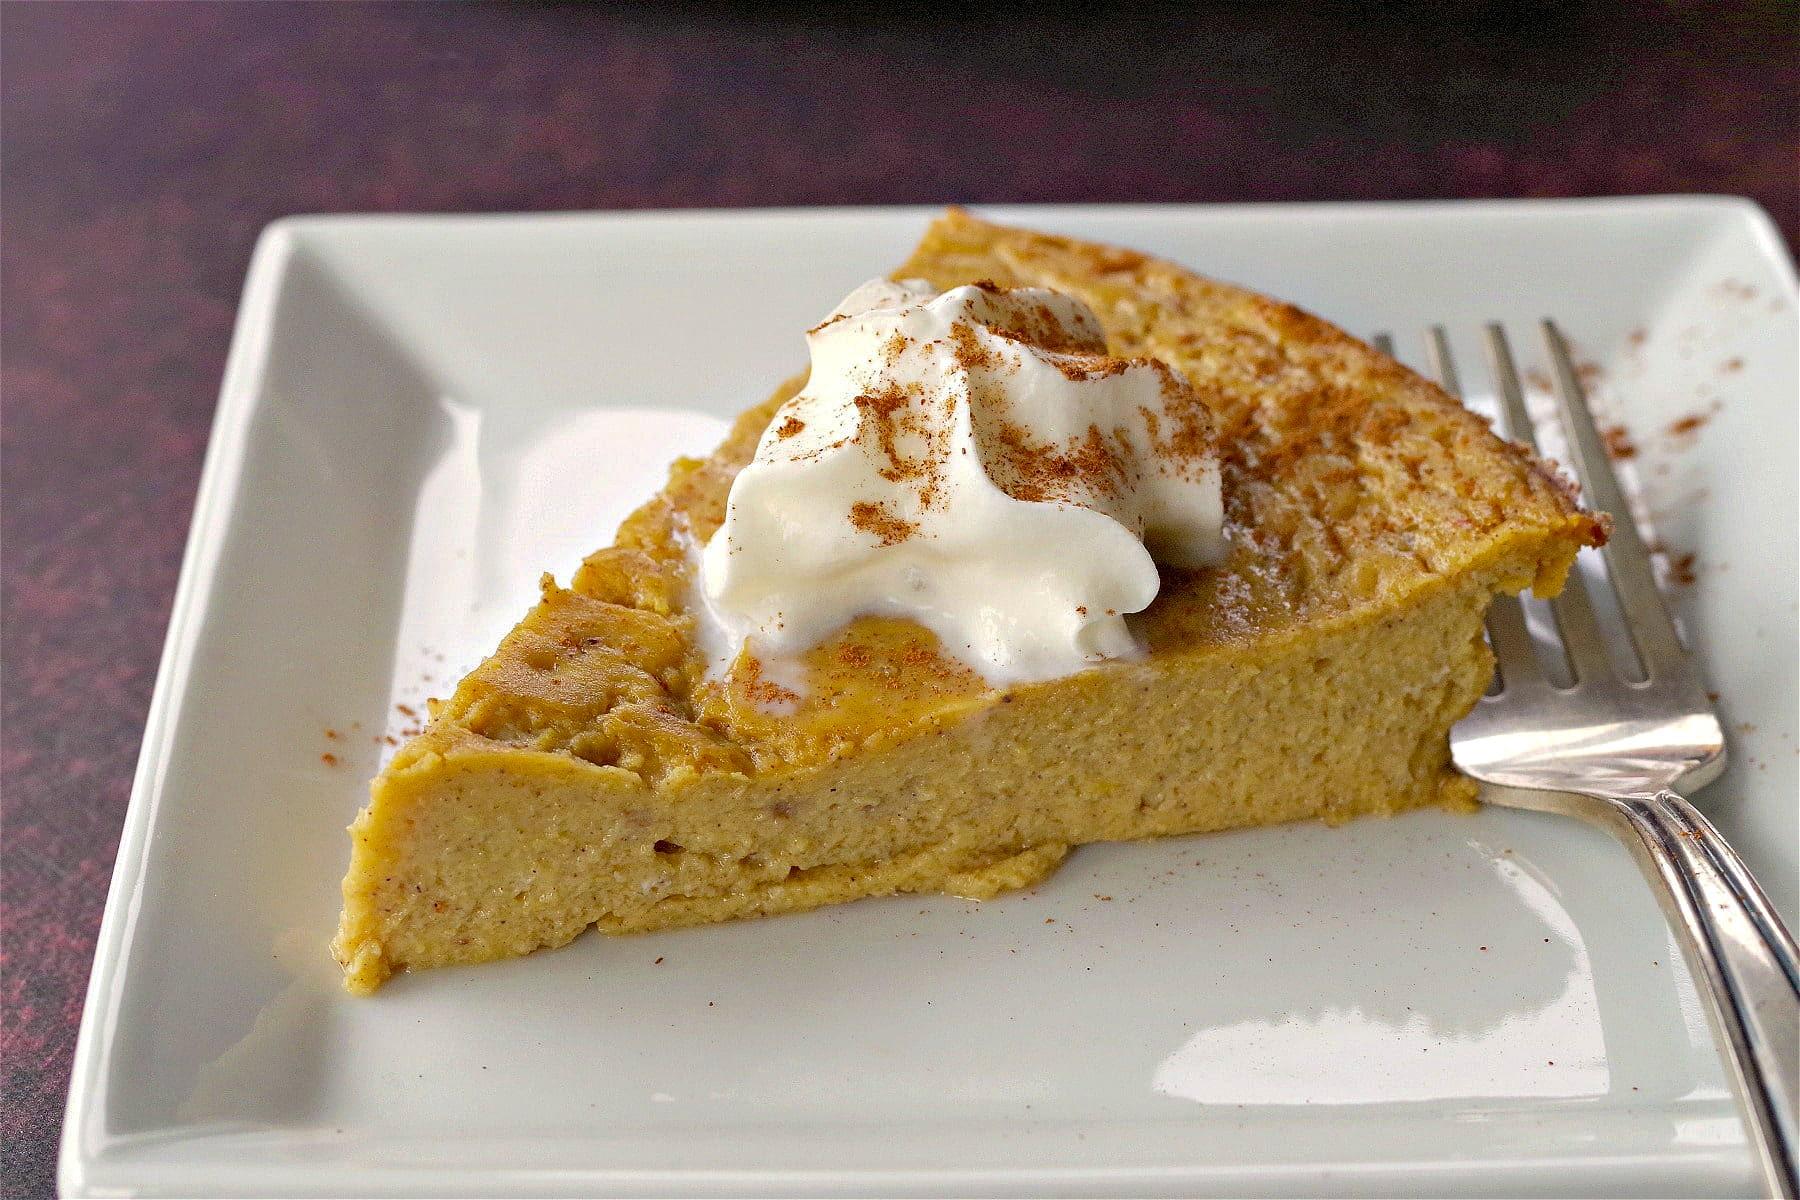 weight watchers crustless pumpkin pie on a white plate